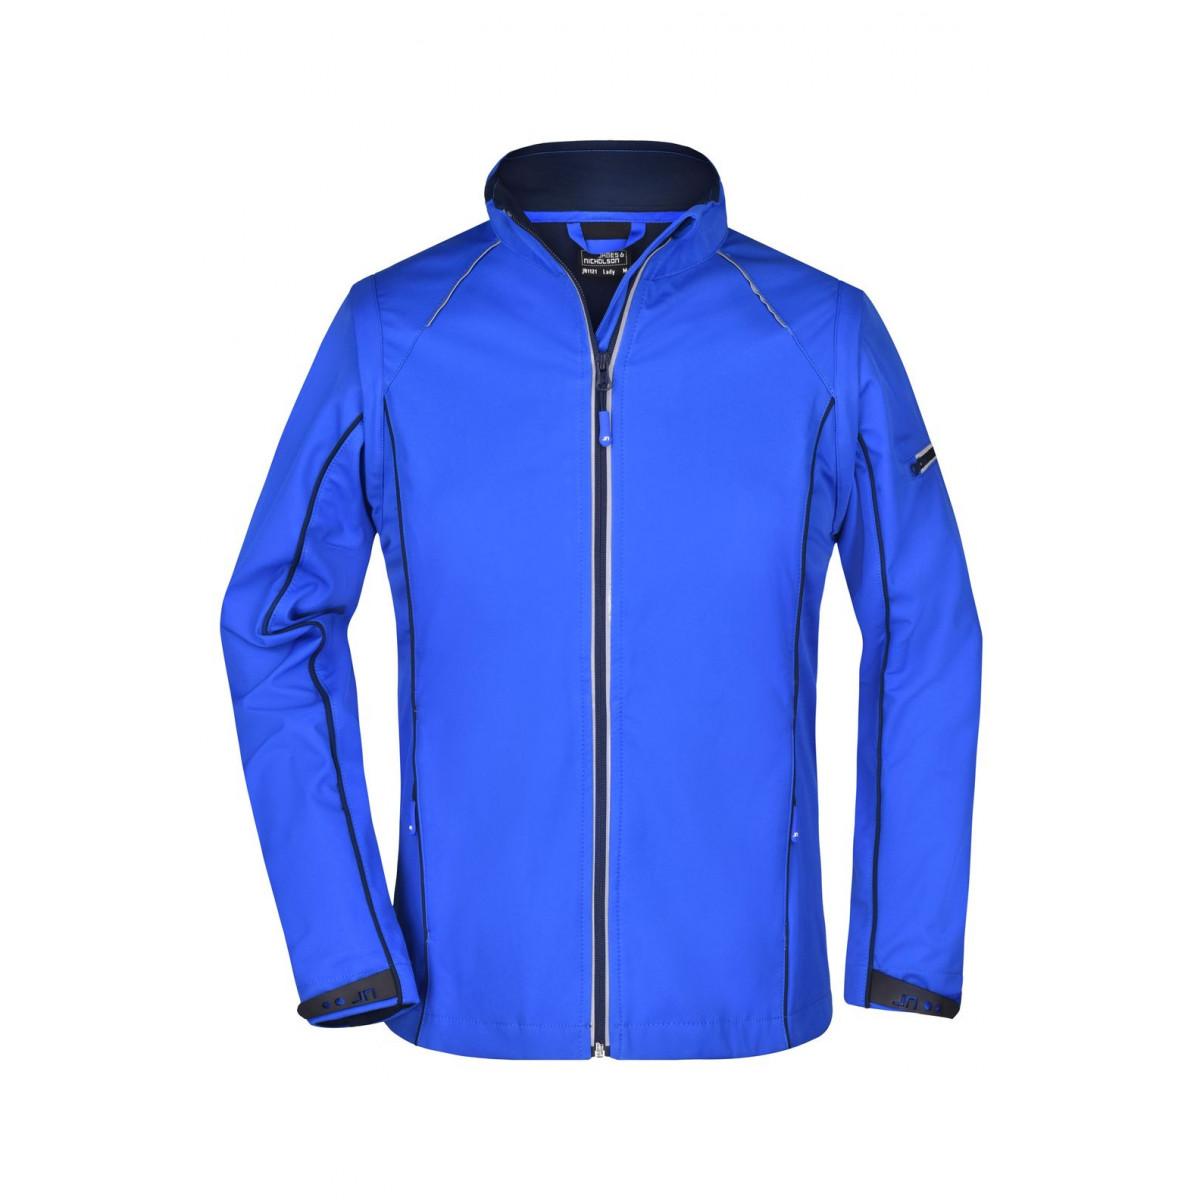 Куртка женская JN1121 Ladies Zip-Off Softshell Jacket - Темно-синий/Темно-синий